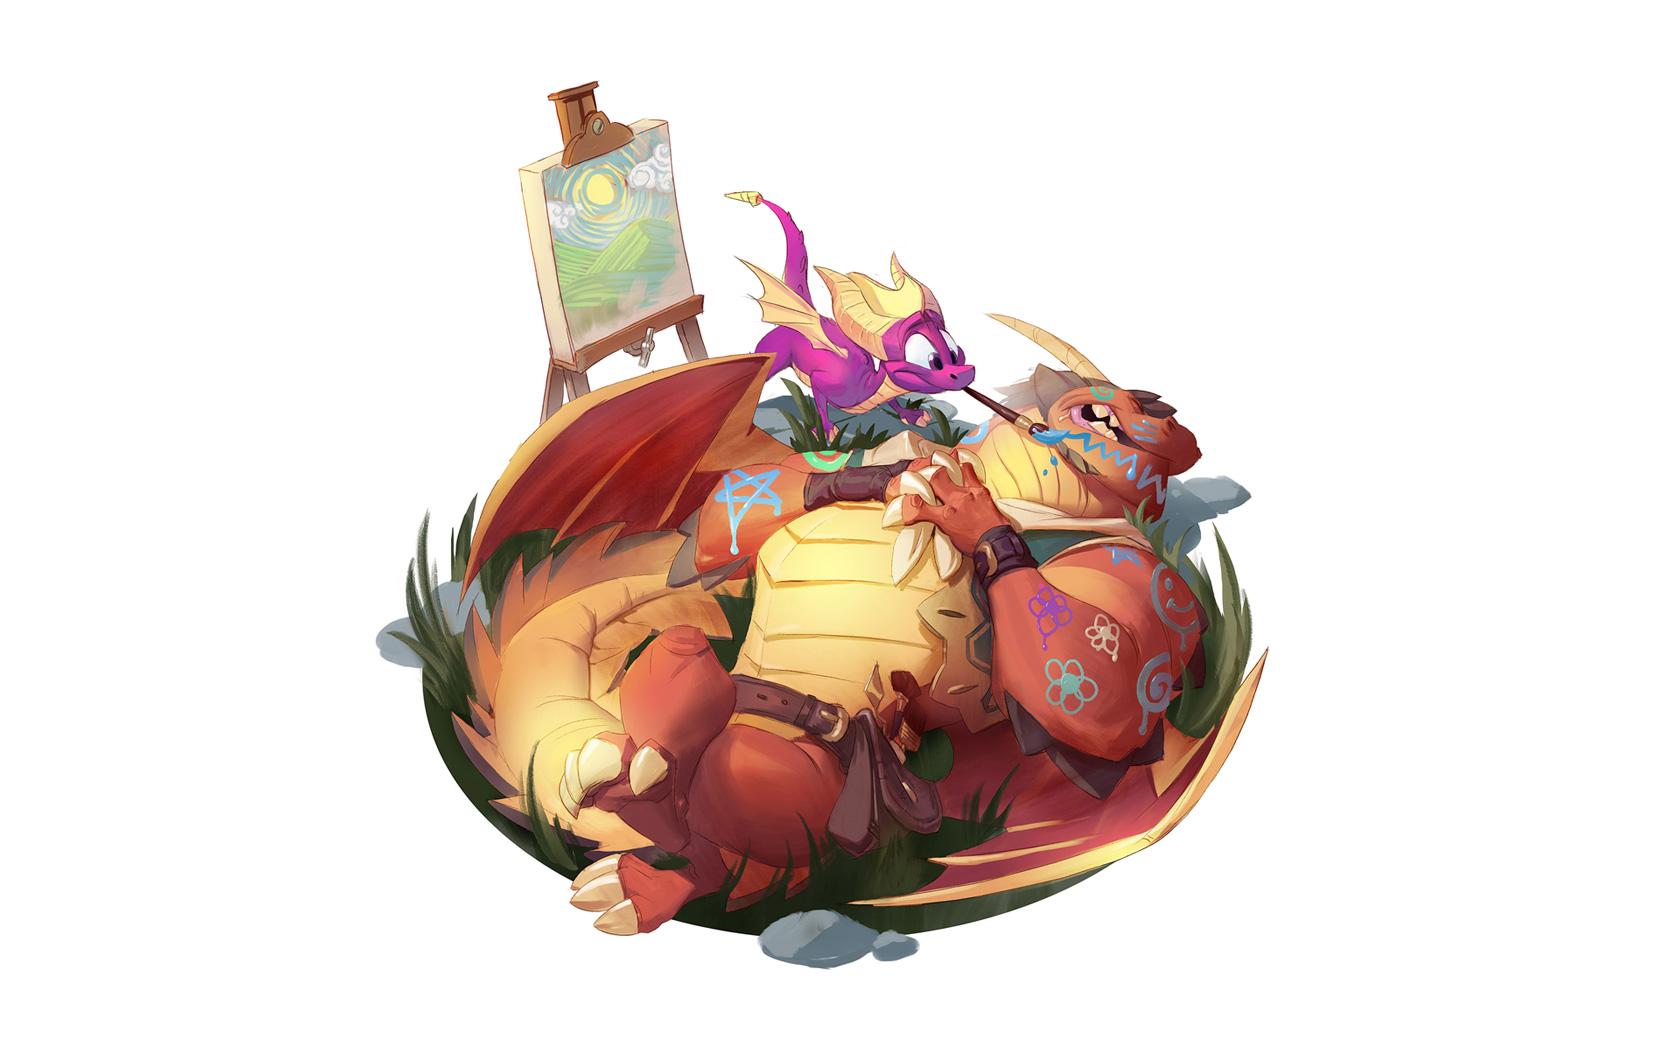 Free Spyro the Dragon Wallpaper in 1680x1050